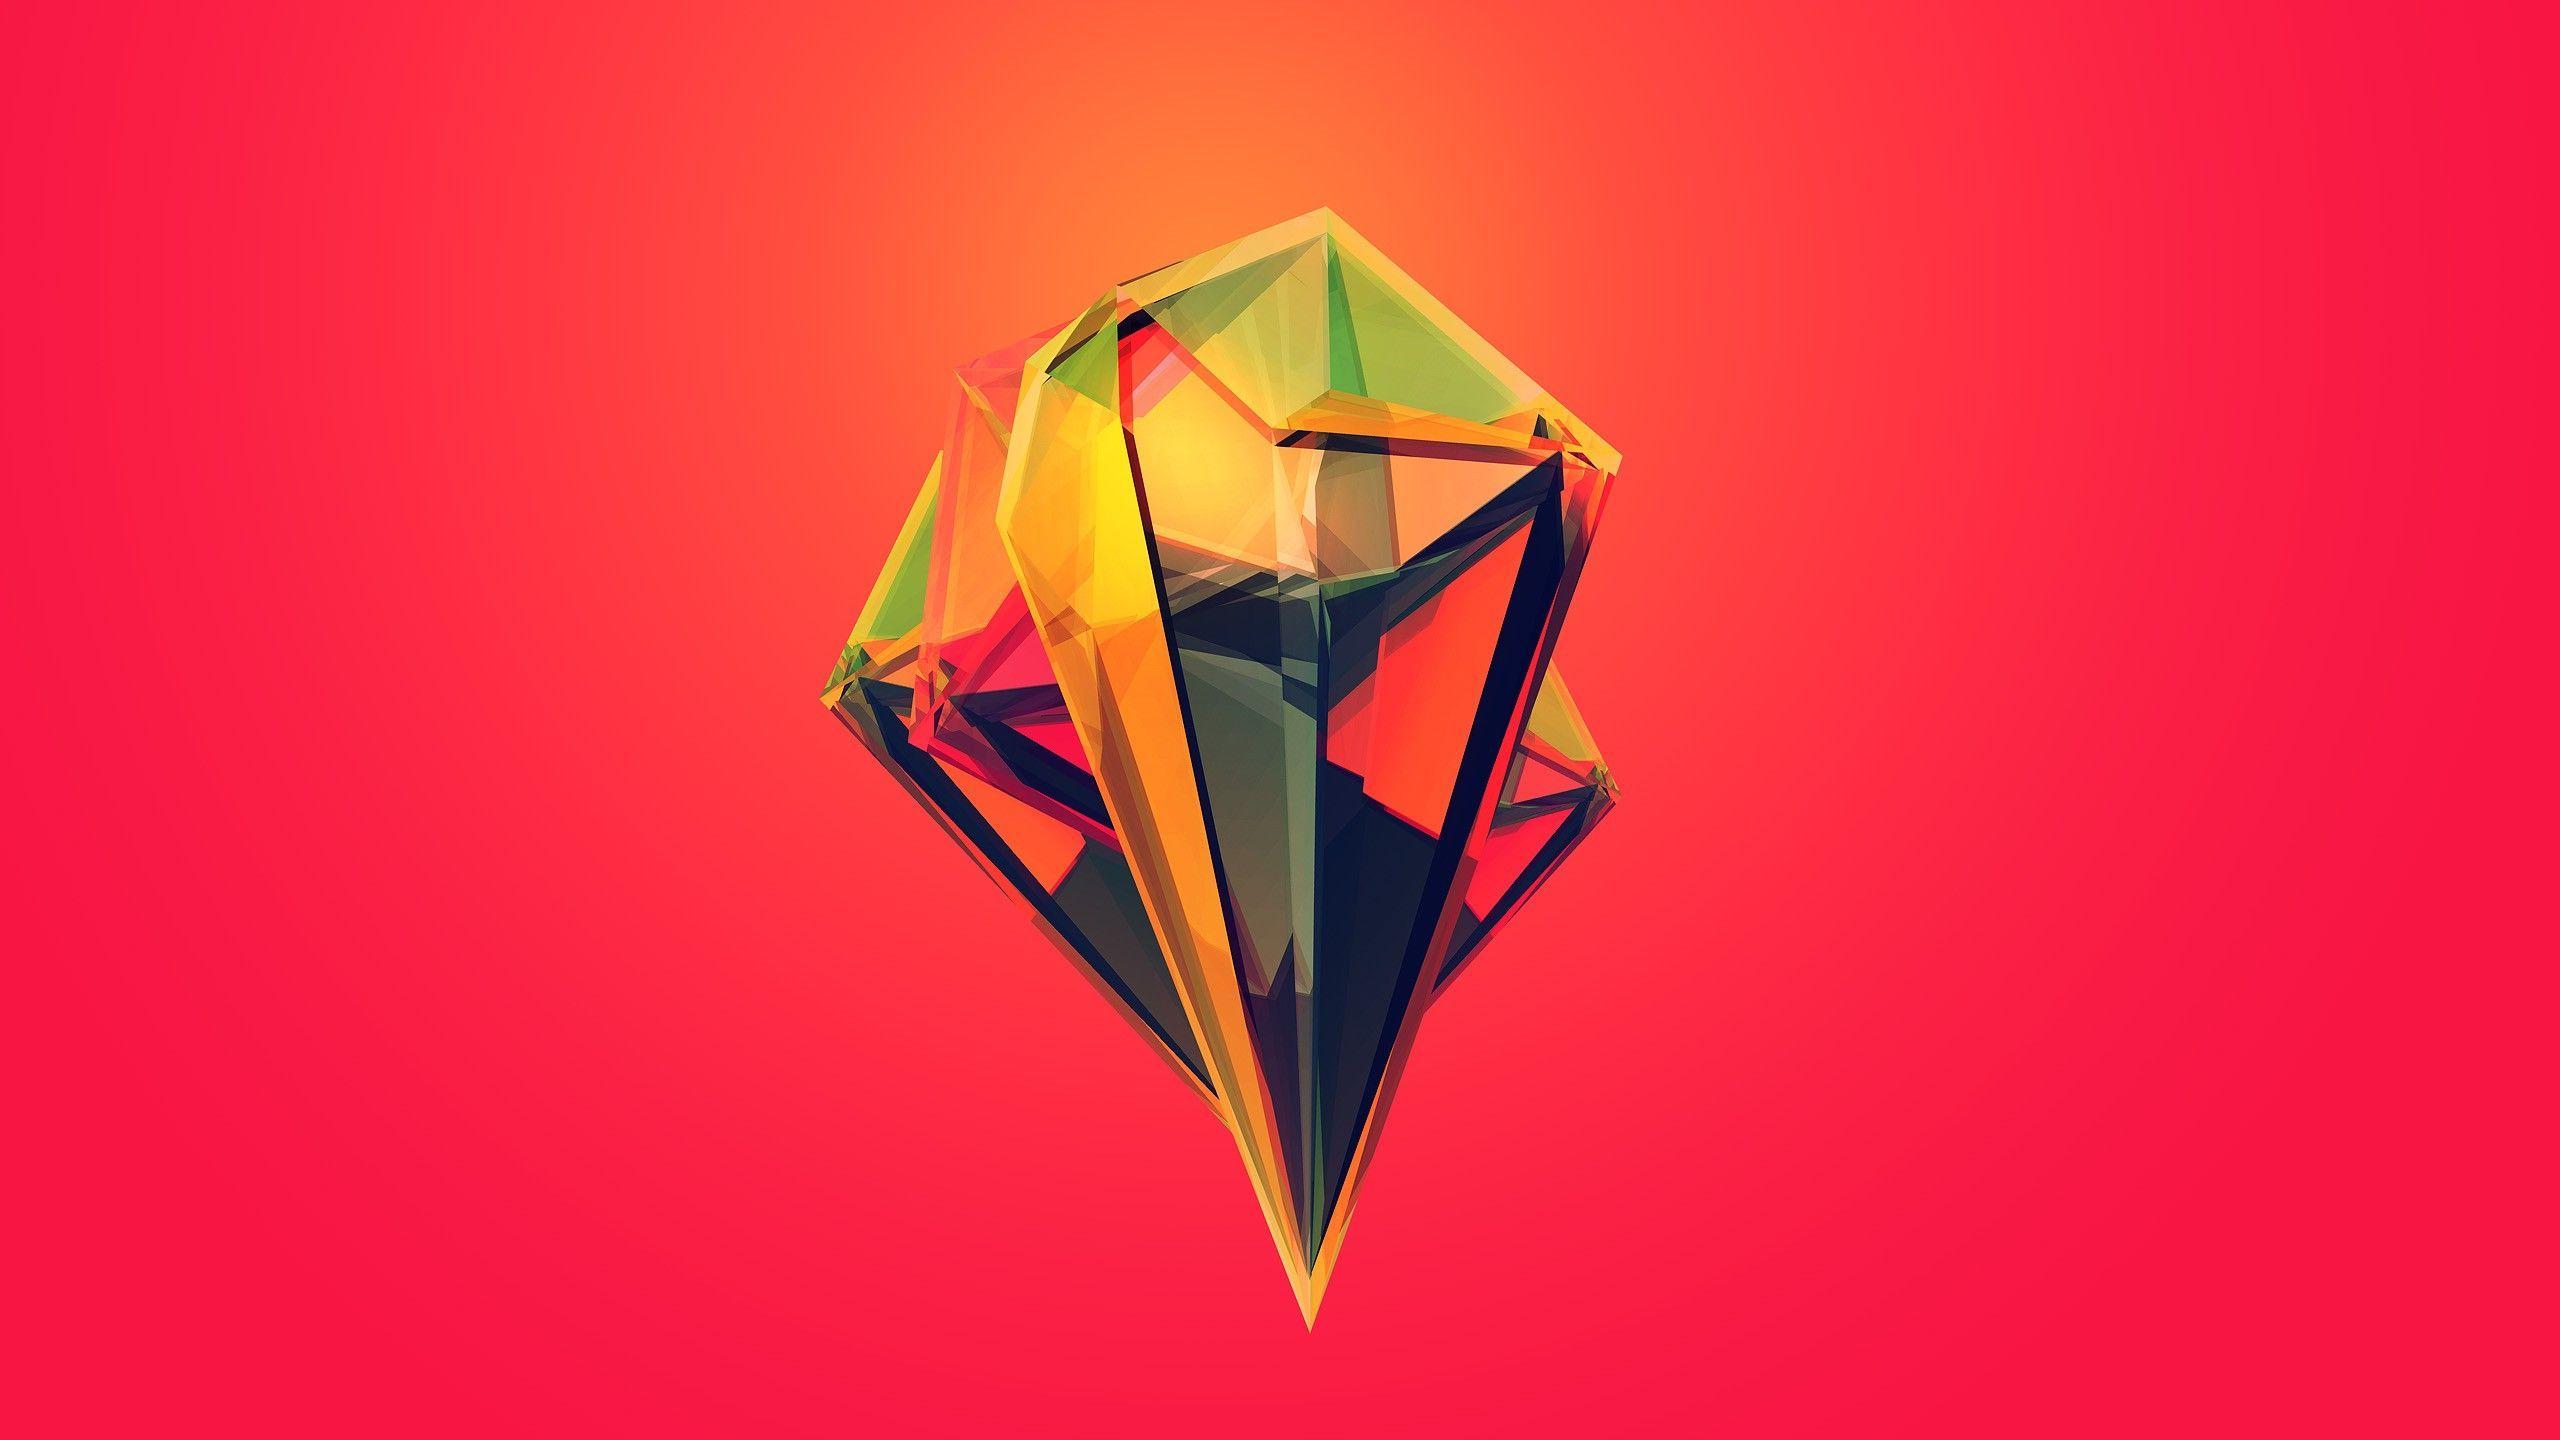 Creative Diamond Wallpapers